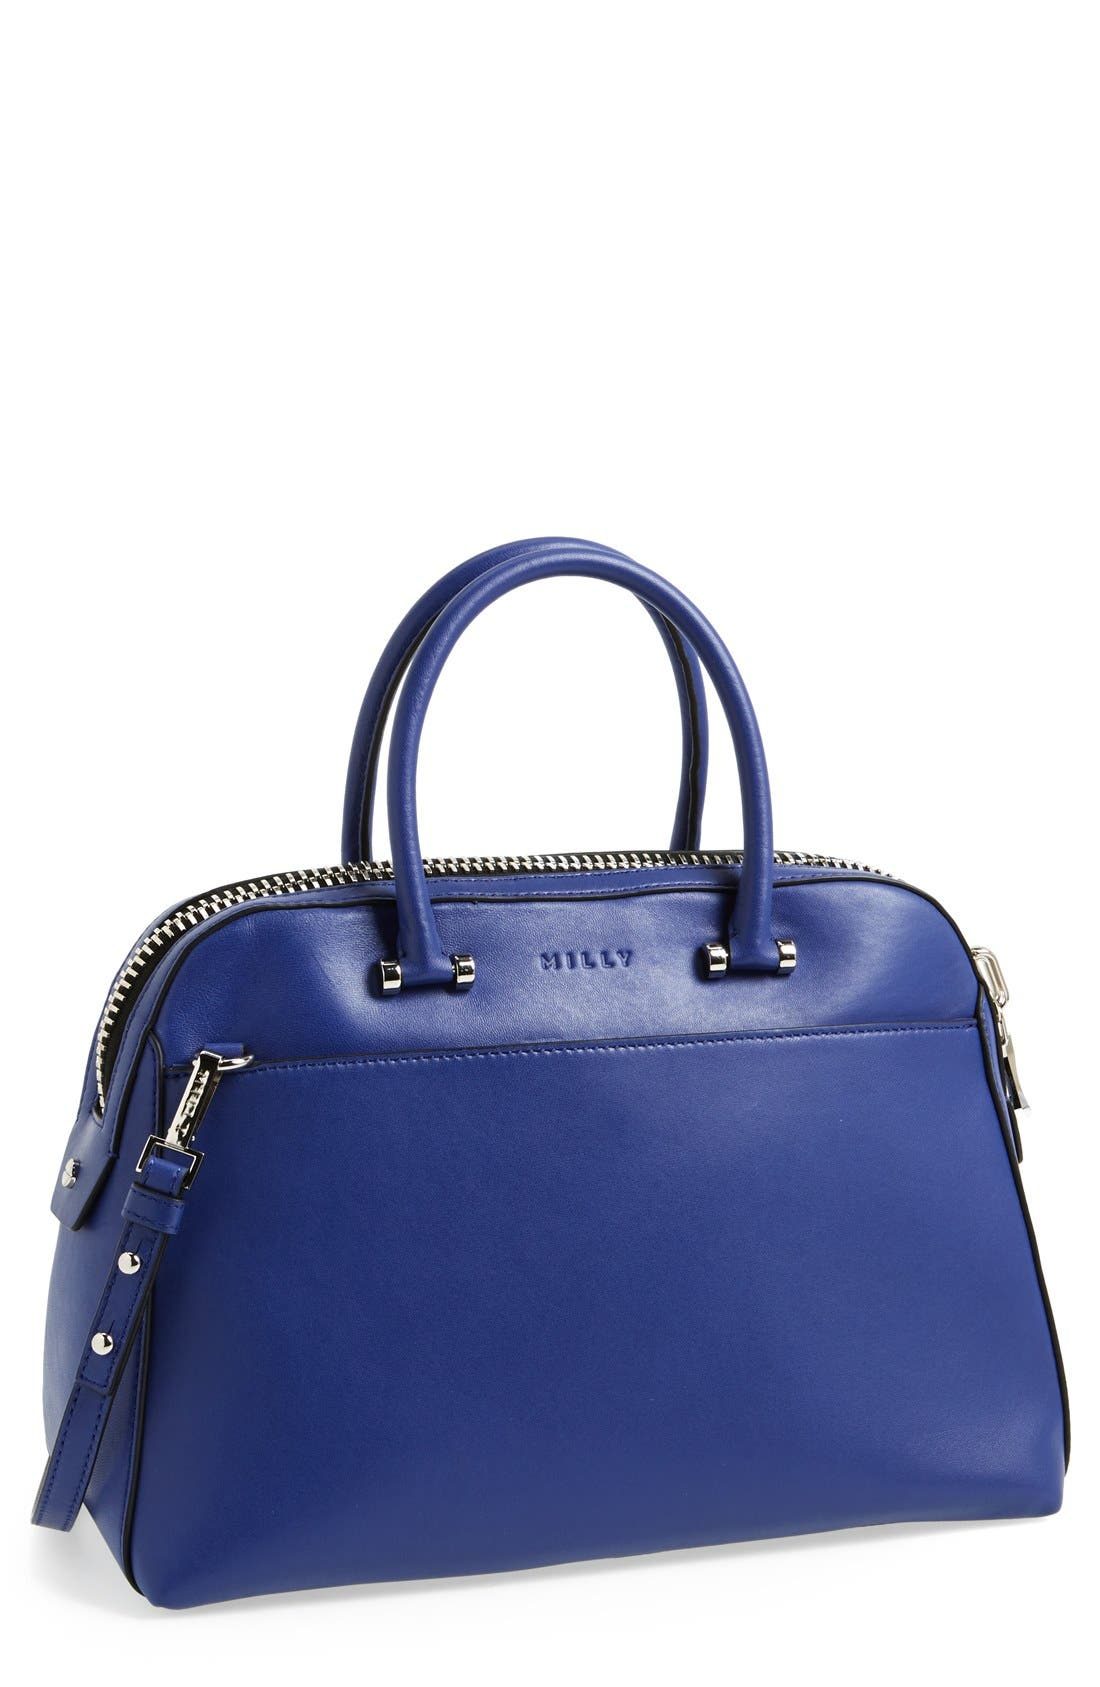 Main Image - Milly 'Medium Blake' Leather Satchel